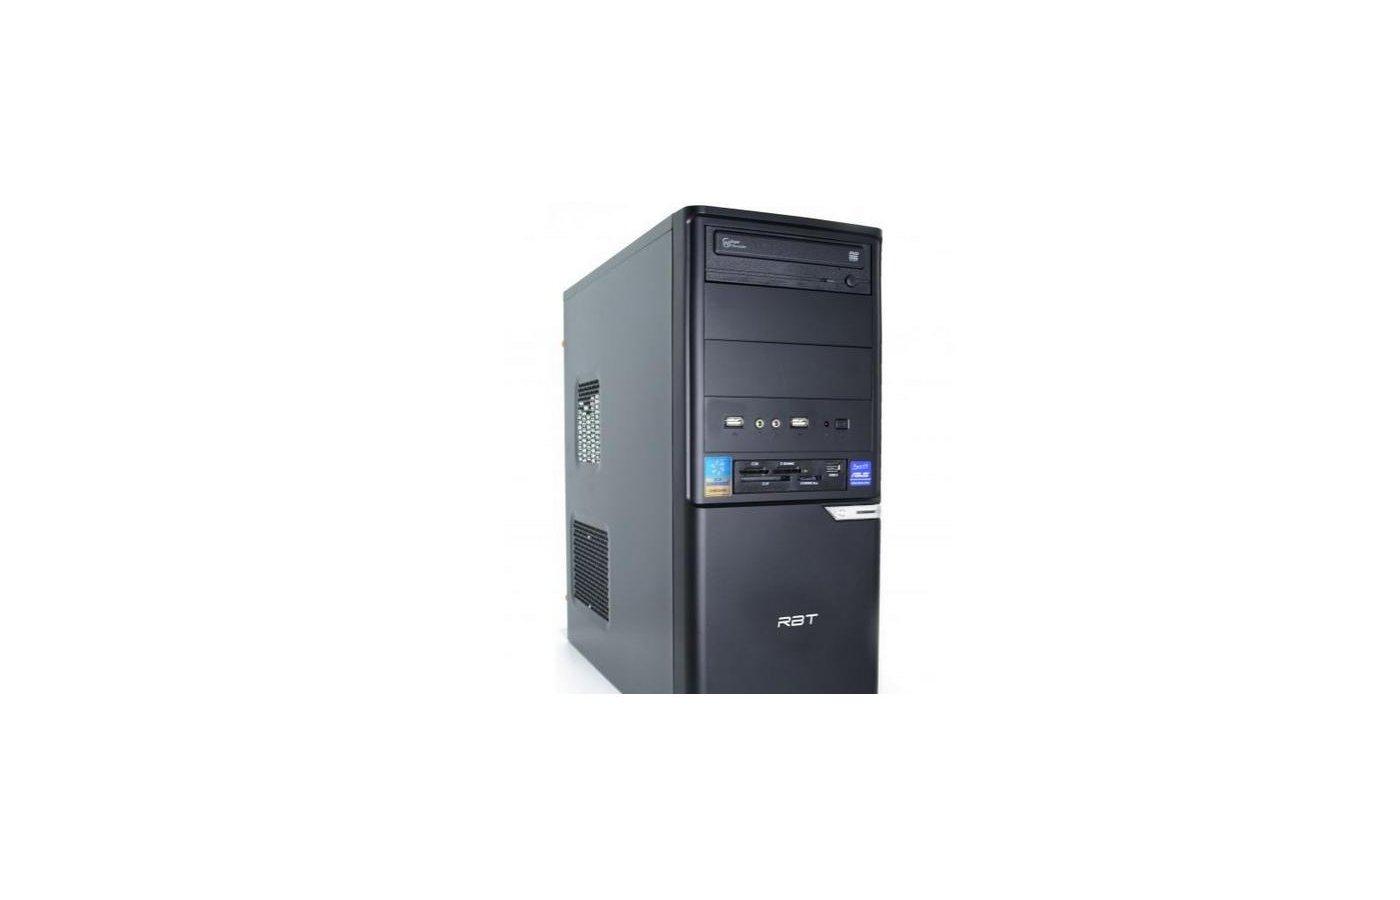 Системный блок РБТ R227 AMD A4 5300 X2 3.4Gh/4Gb/500Gb/HD7480D/DVDRW/CR